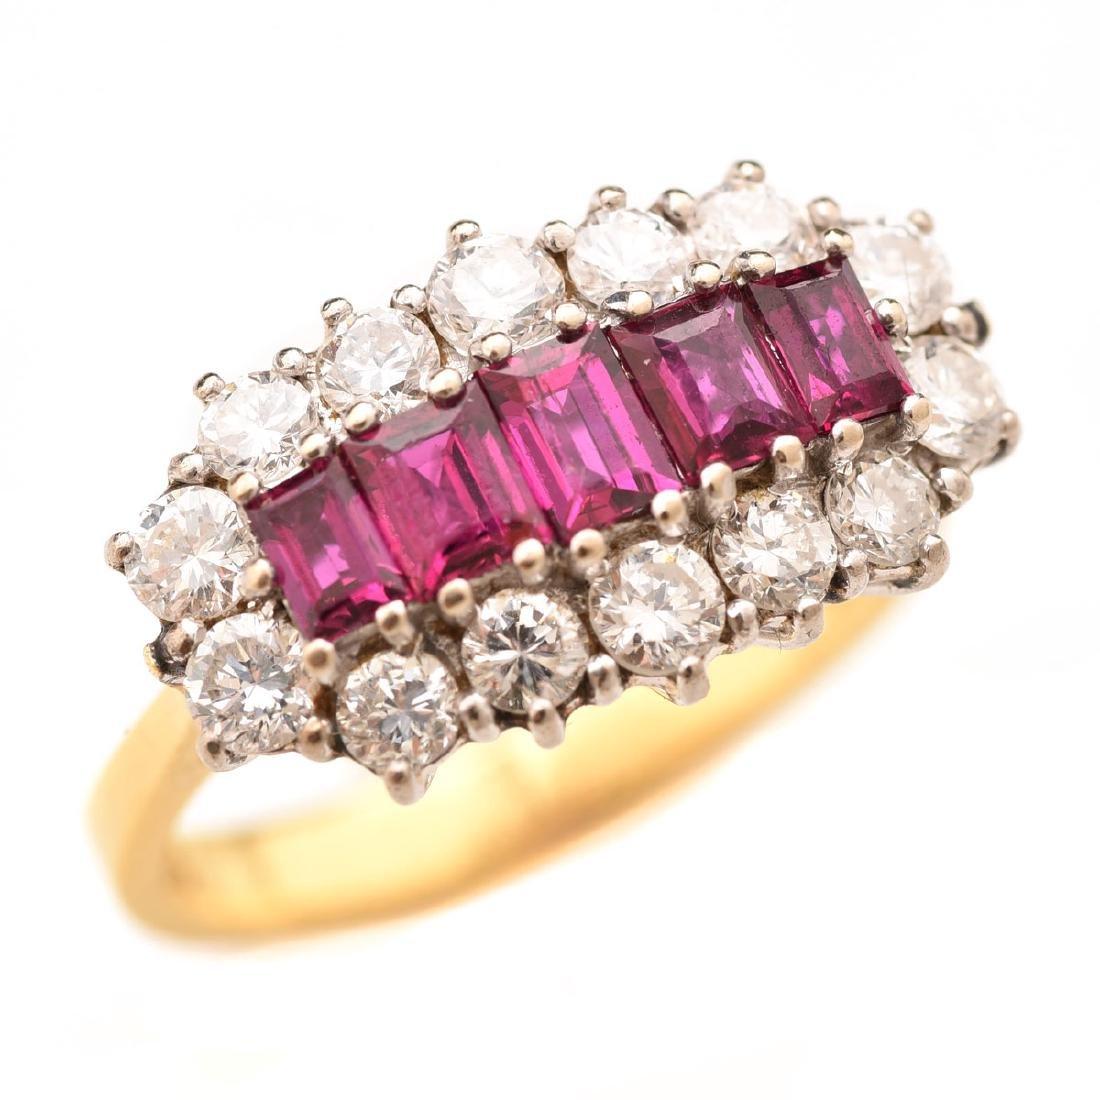 Ruby, Diamond, Platinum, 18k Yellow Gold Ring.